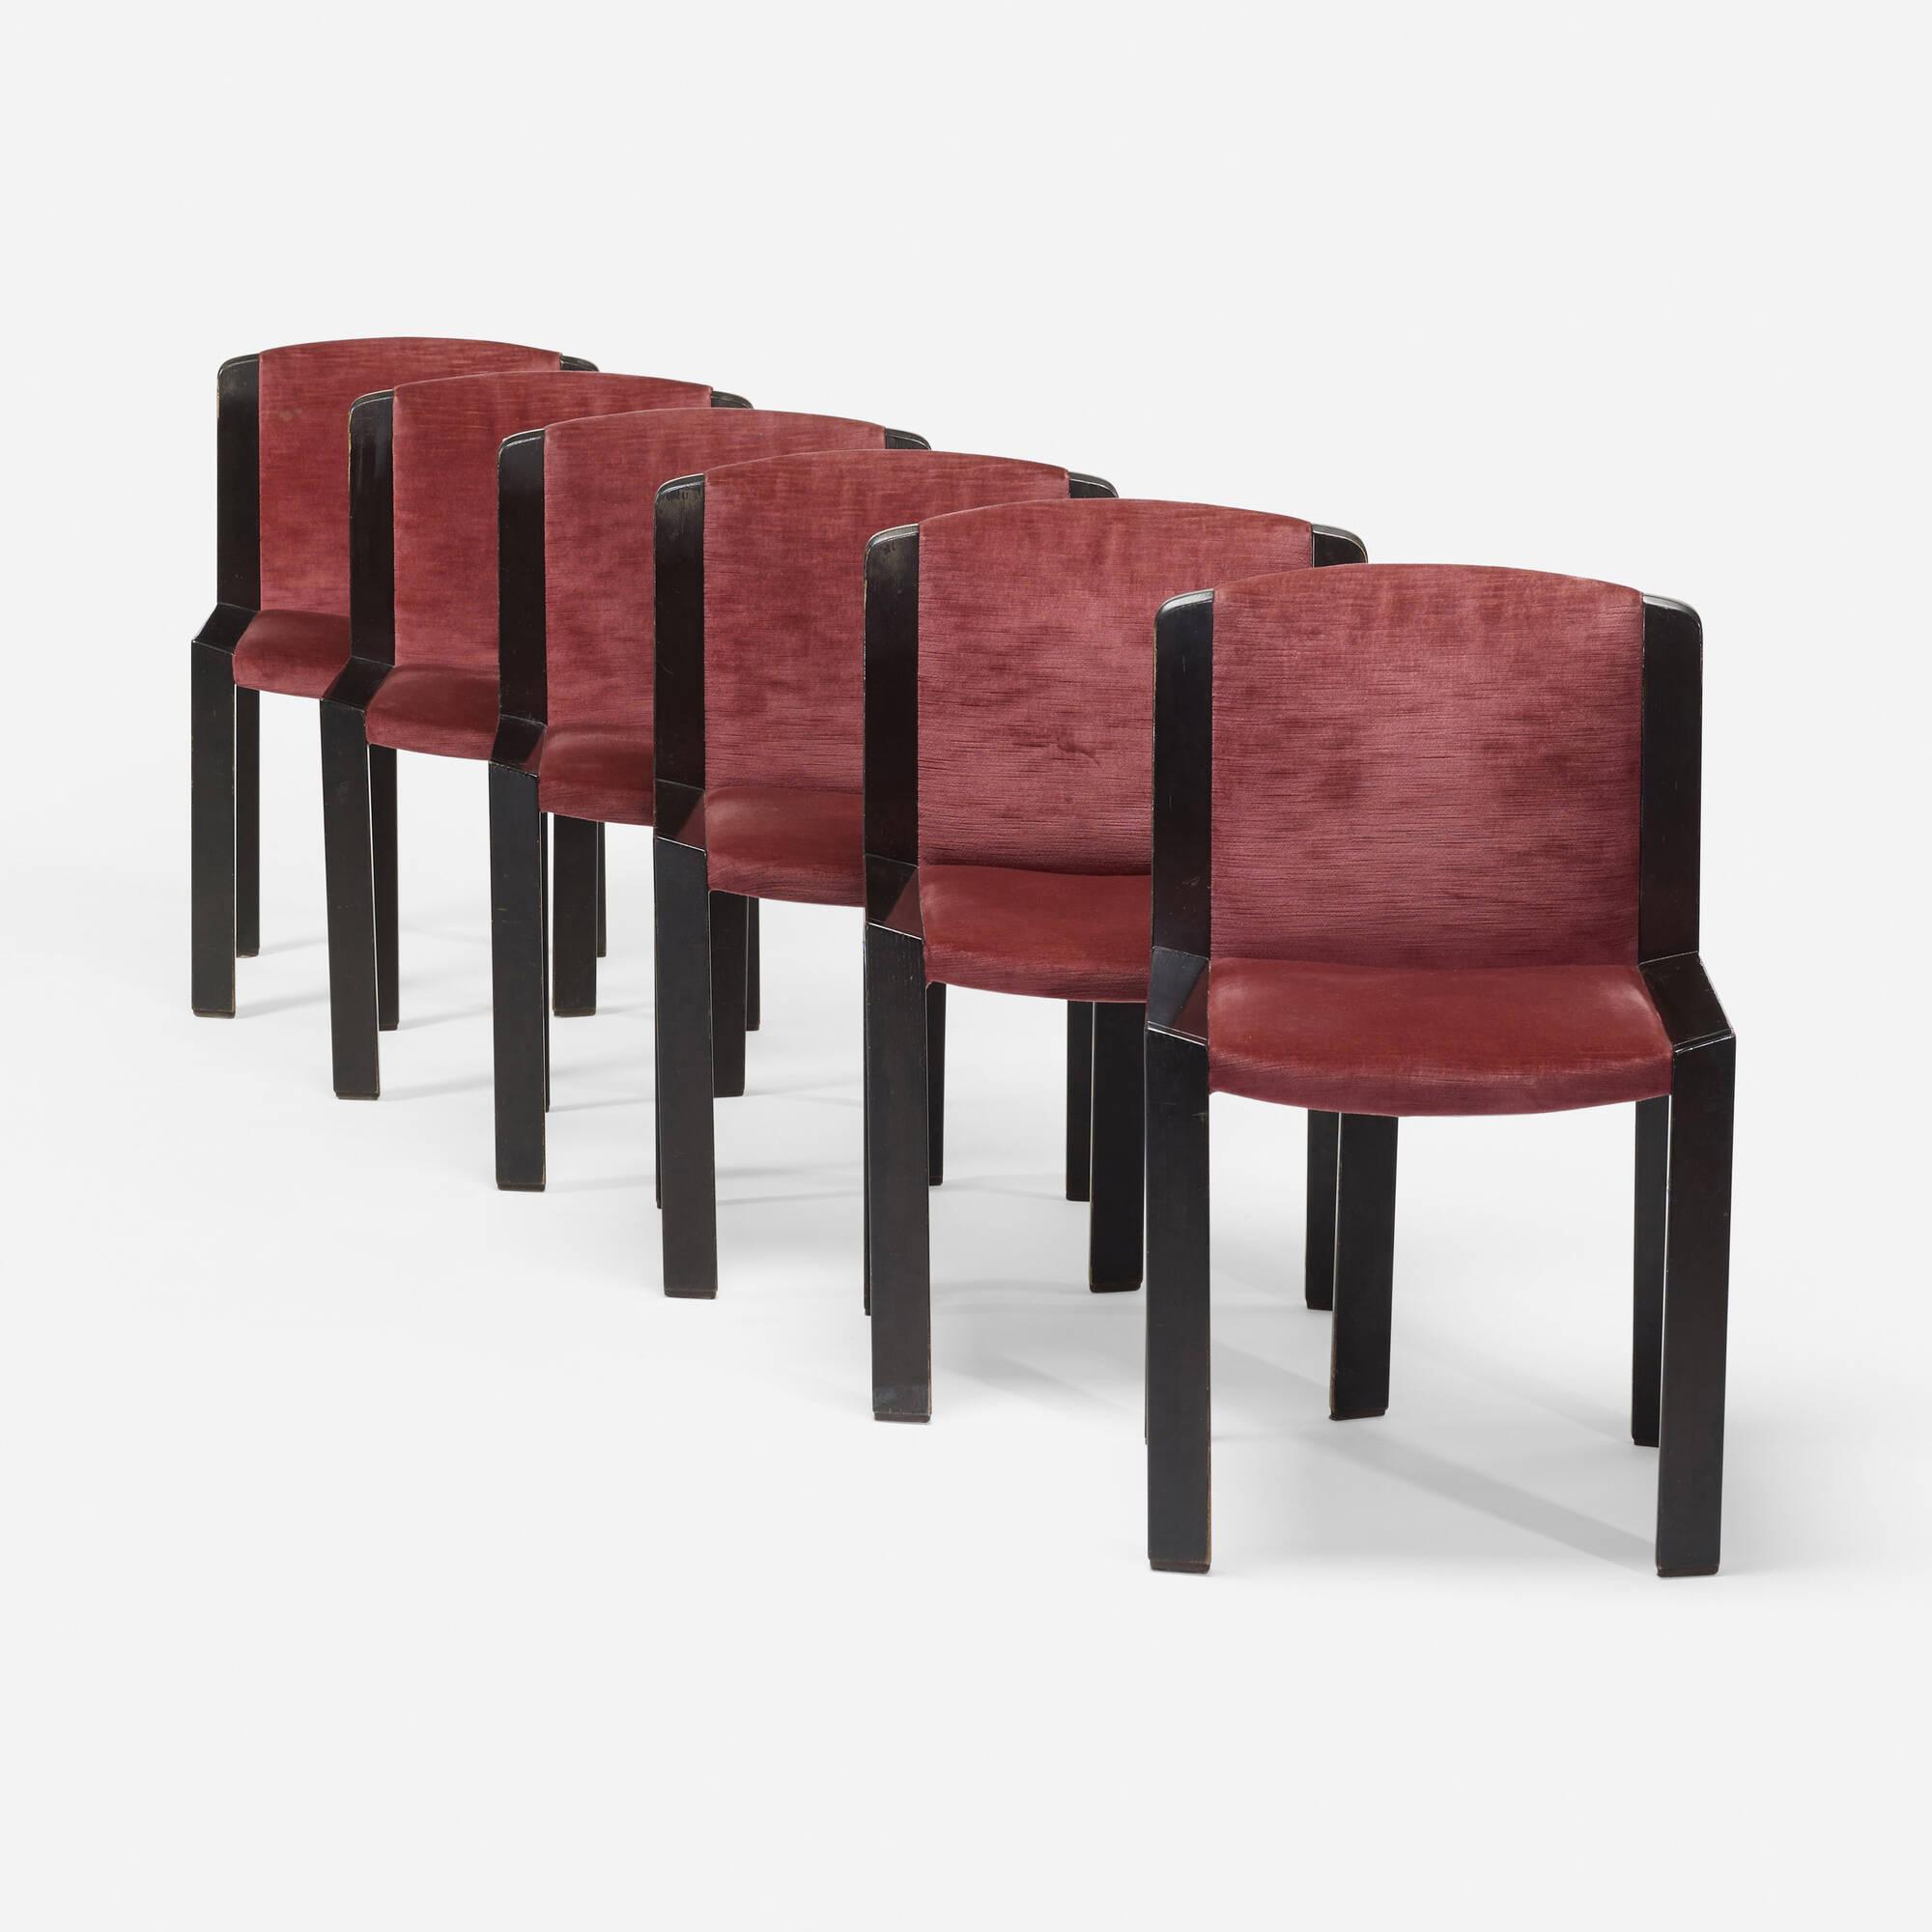 390: Joe Colombo / Model 300 dining chairs, set of six (1 of 3)